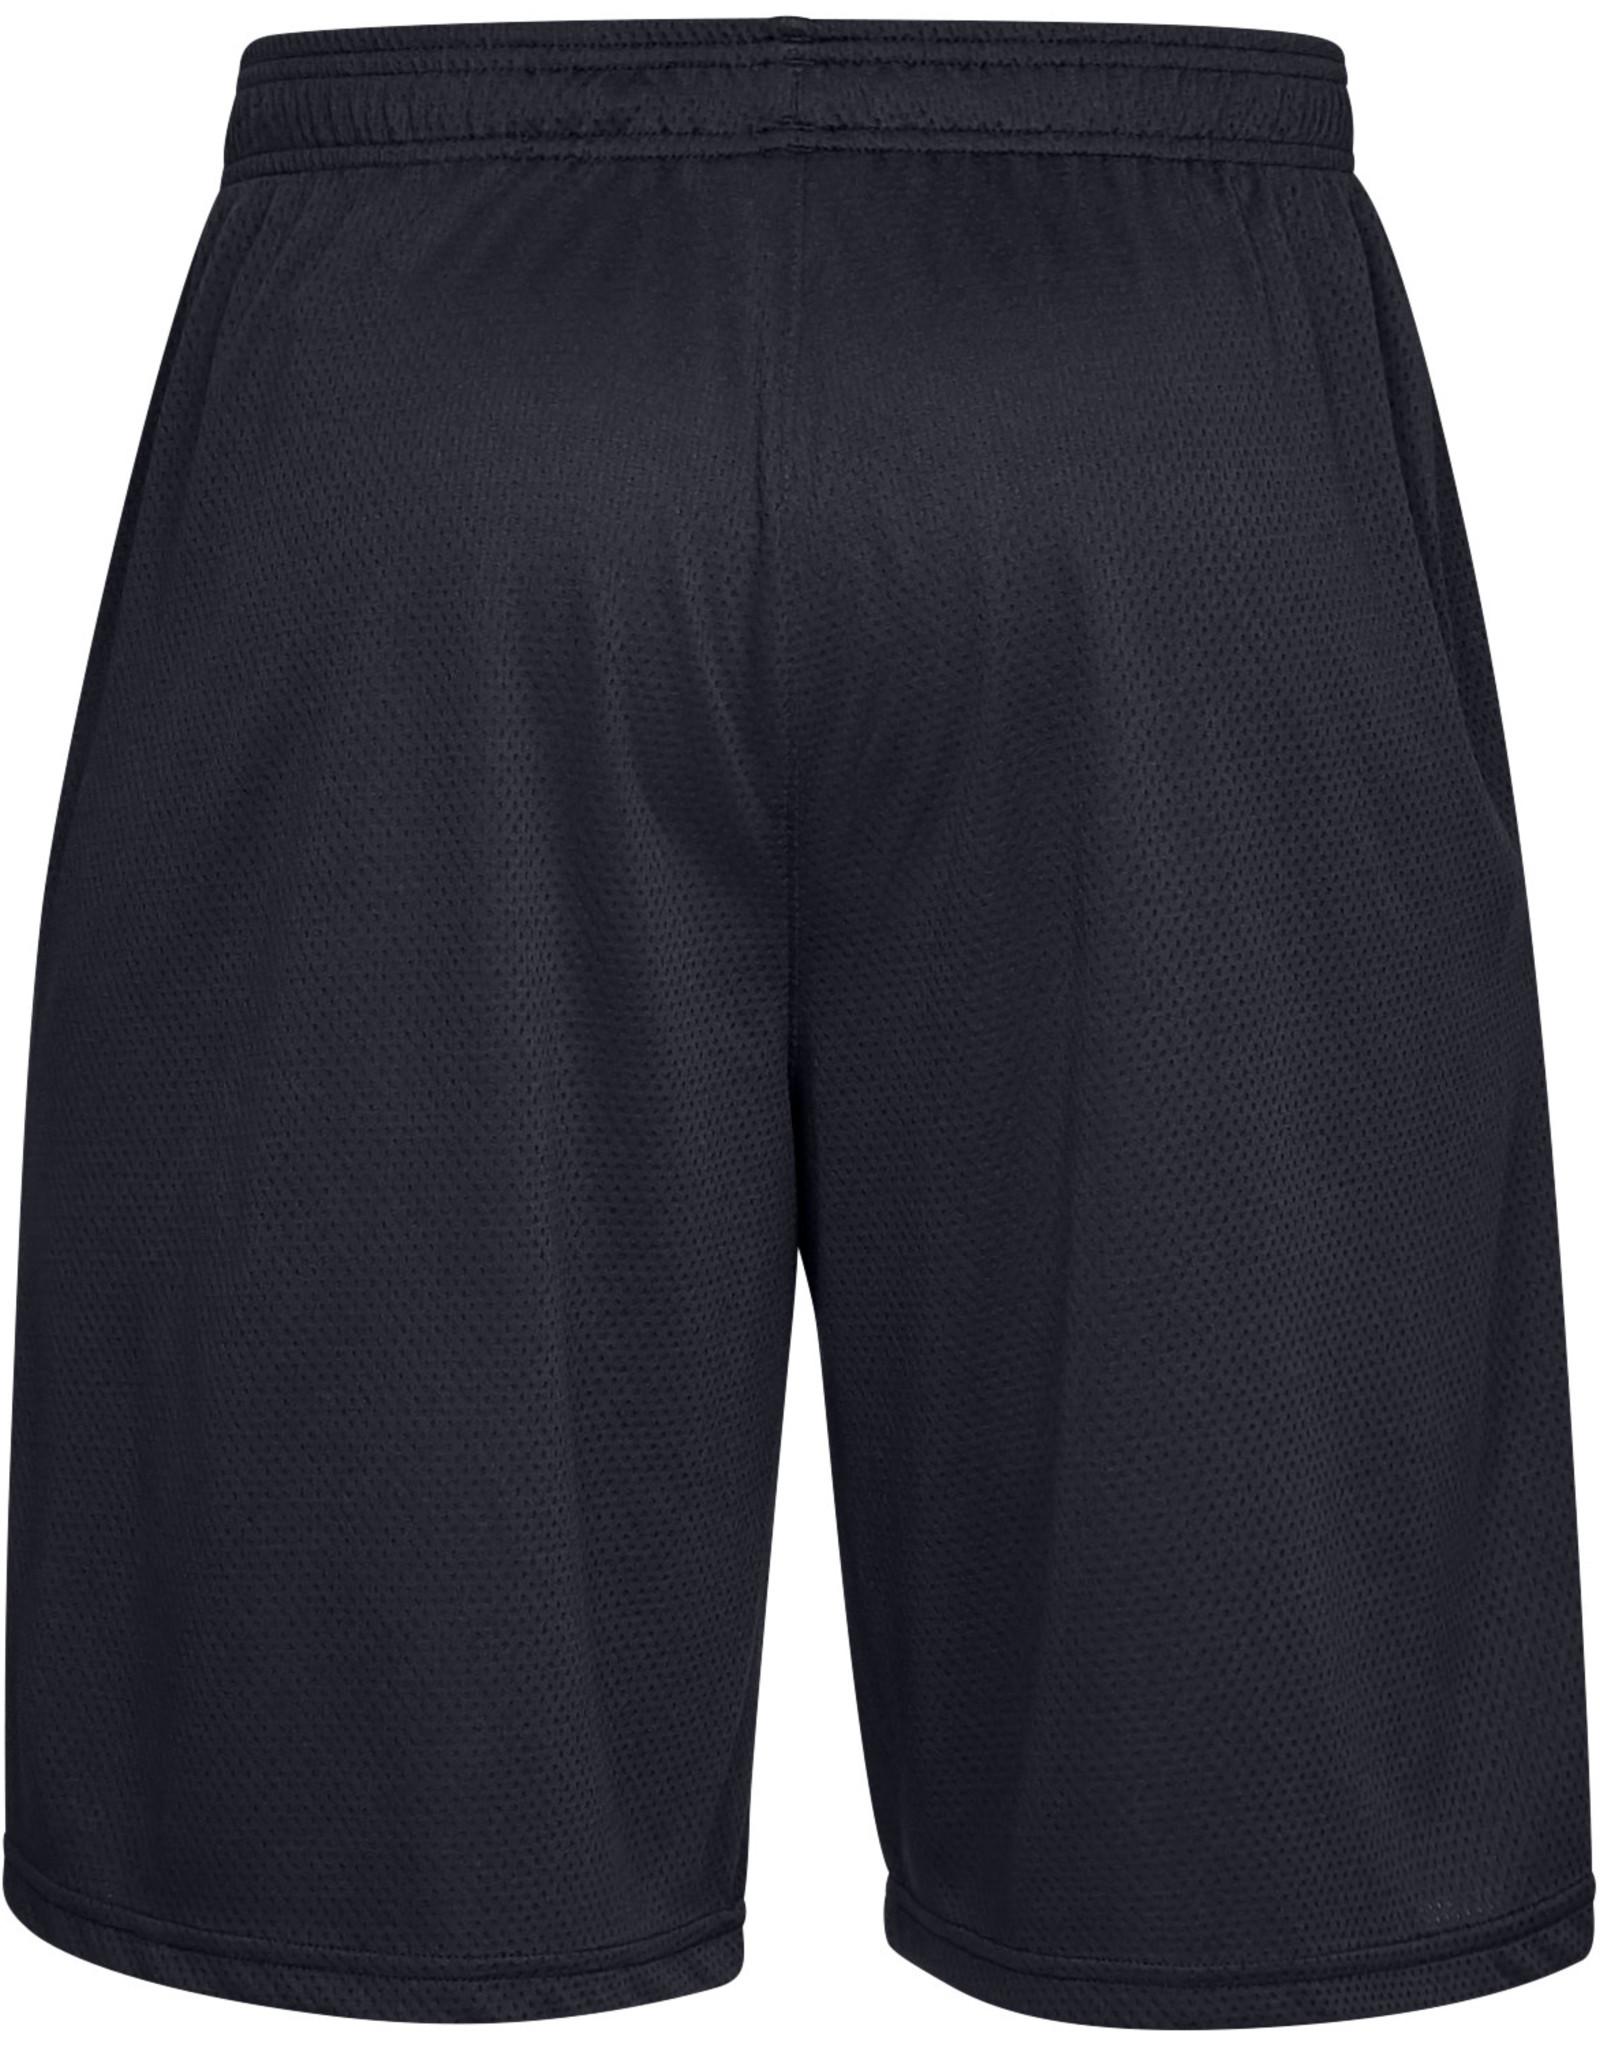 Under Armour UA Tech Mesh Shorts-BLK